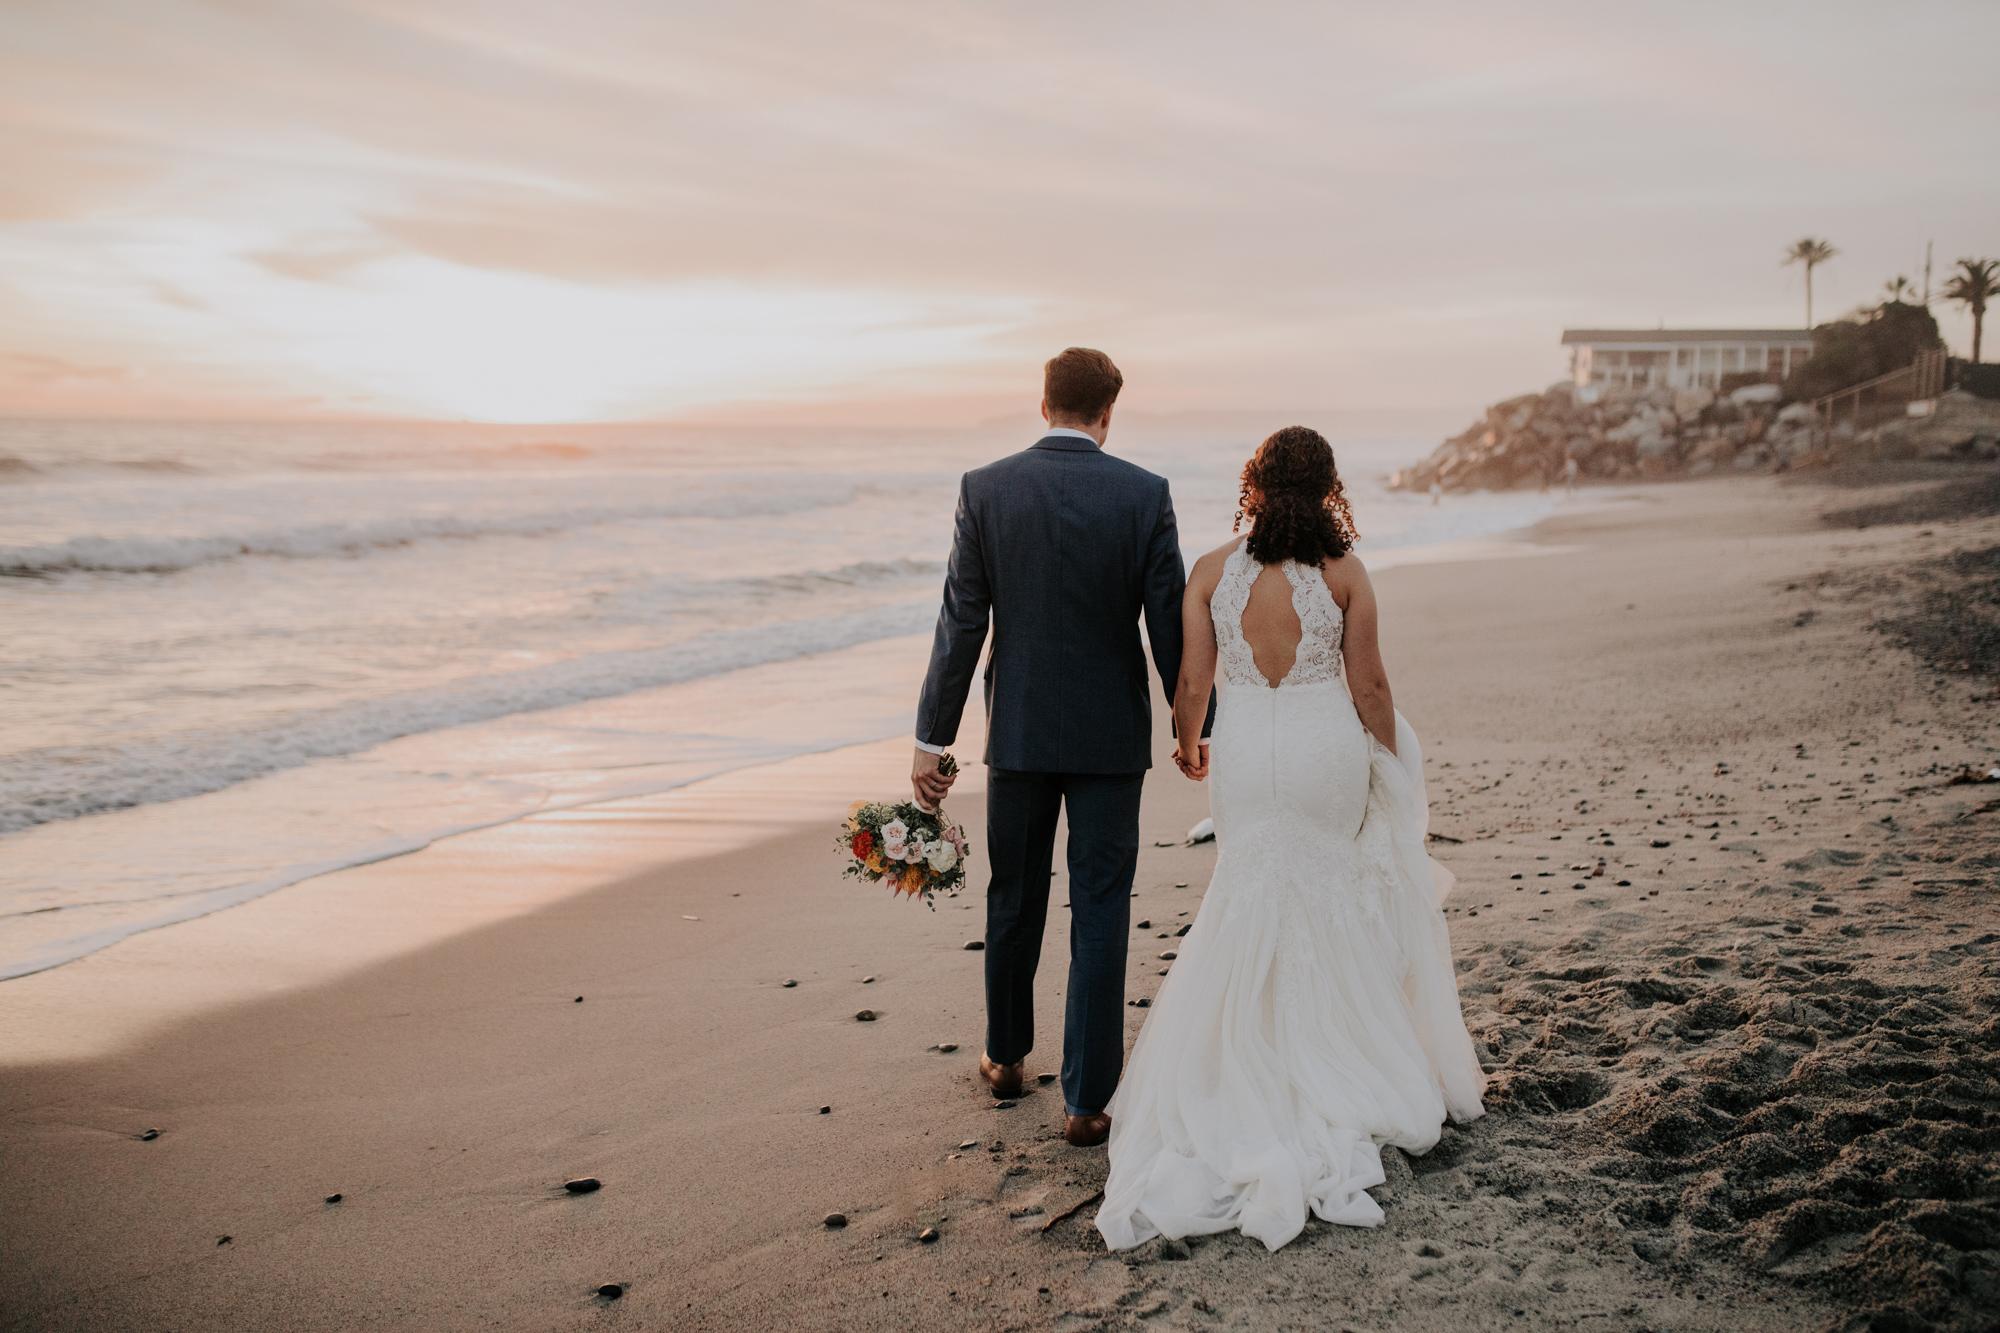 144-destination-wedding-san-clemente-california.jpg